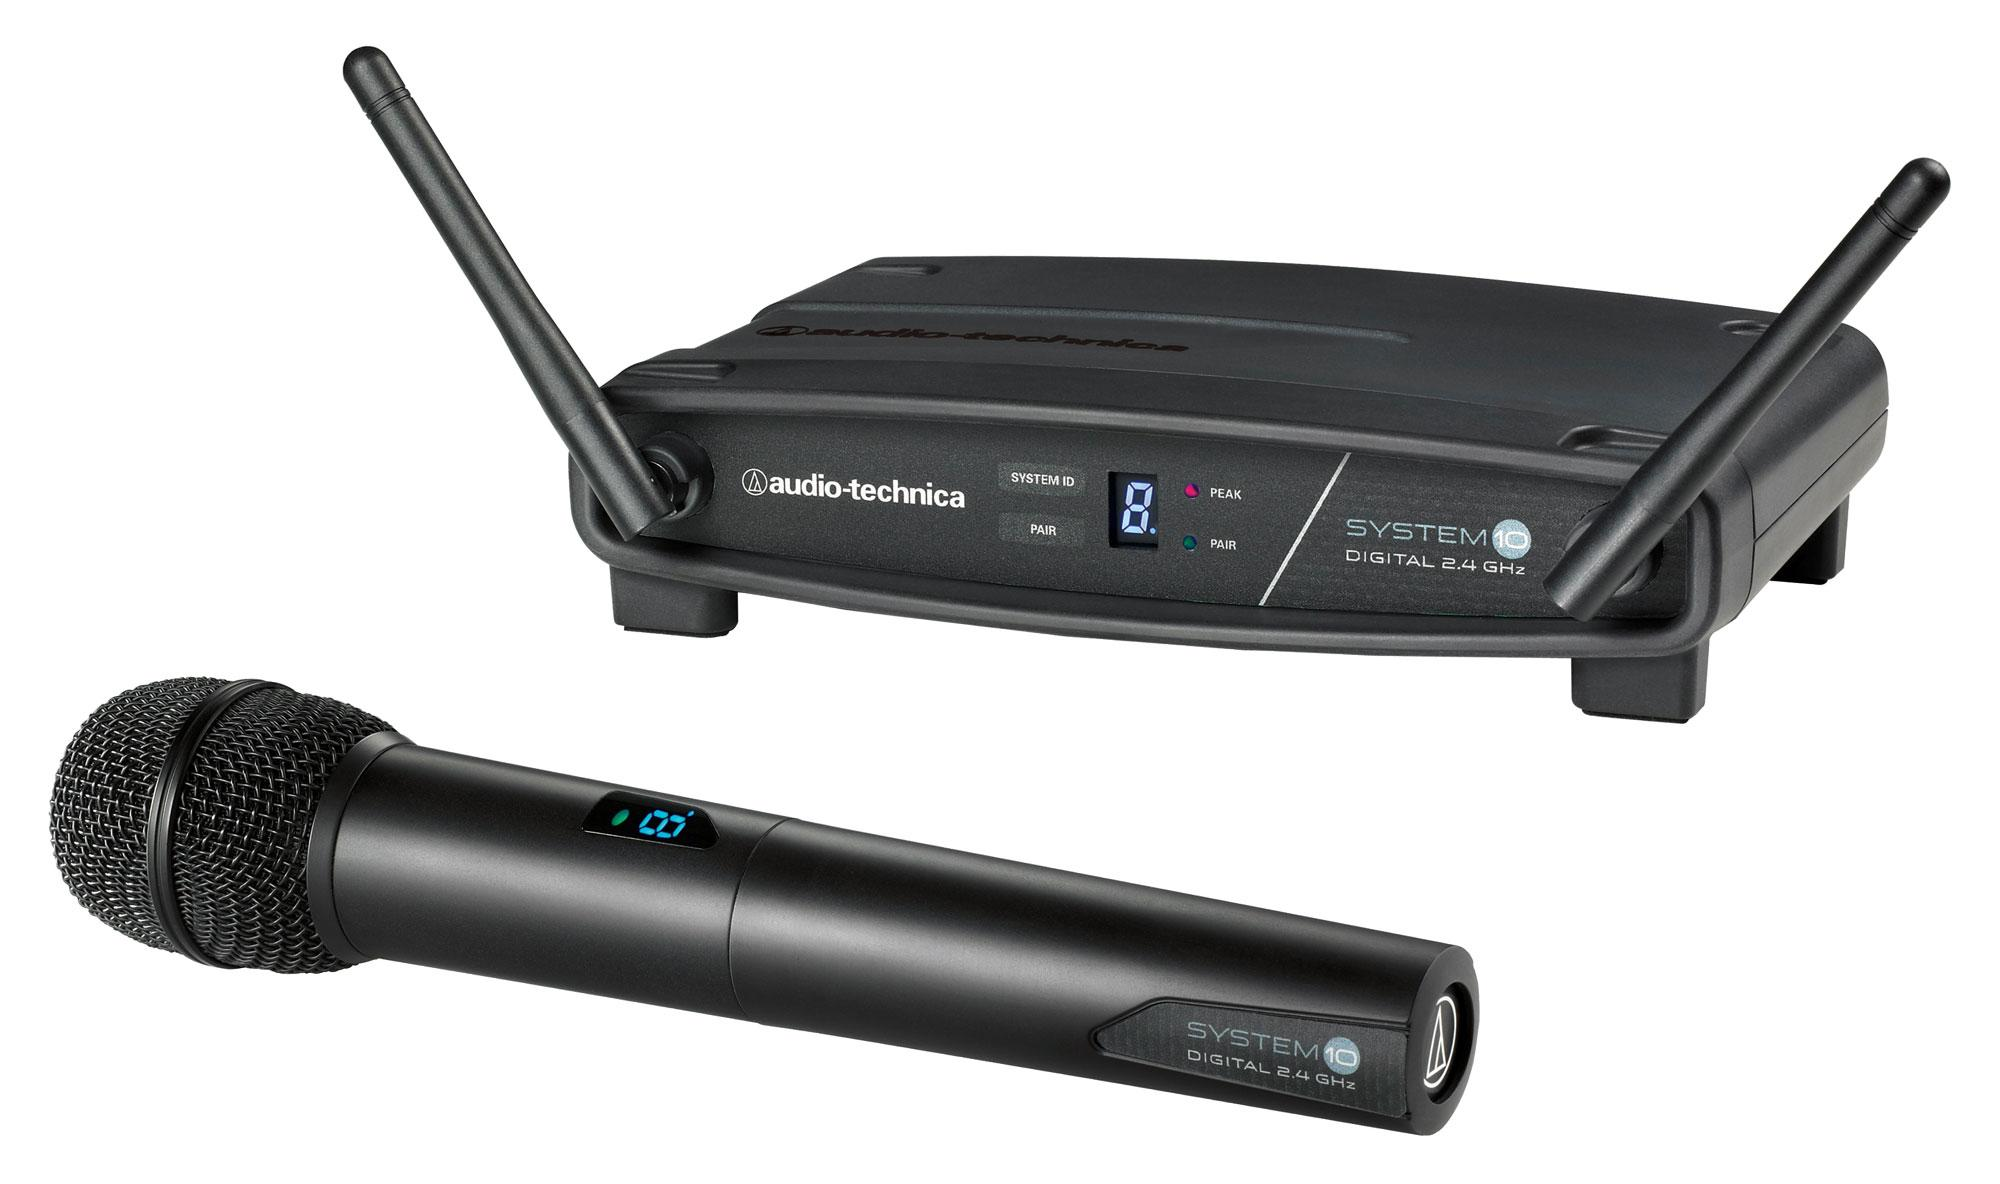 Audio Technica ATW 1102 Handheld Funkset